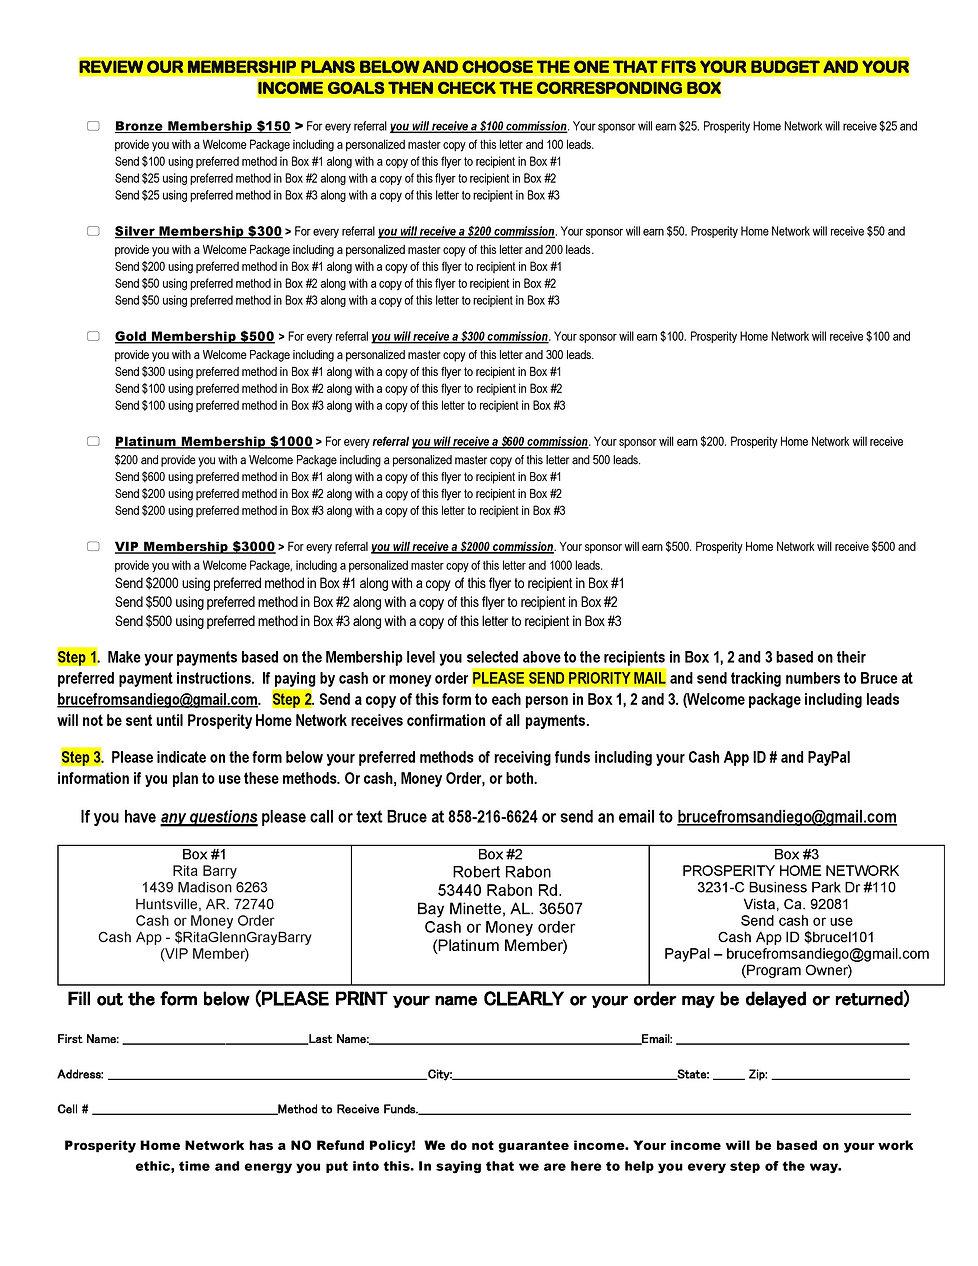 Rita Barry PDF-page-002.jpg